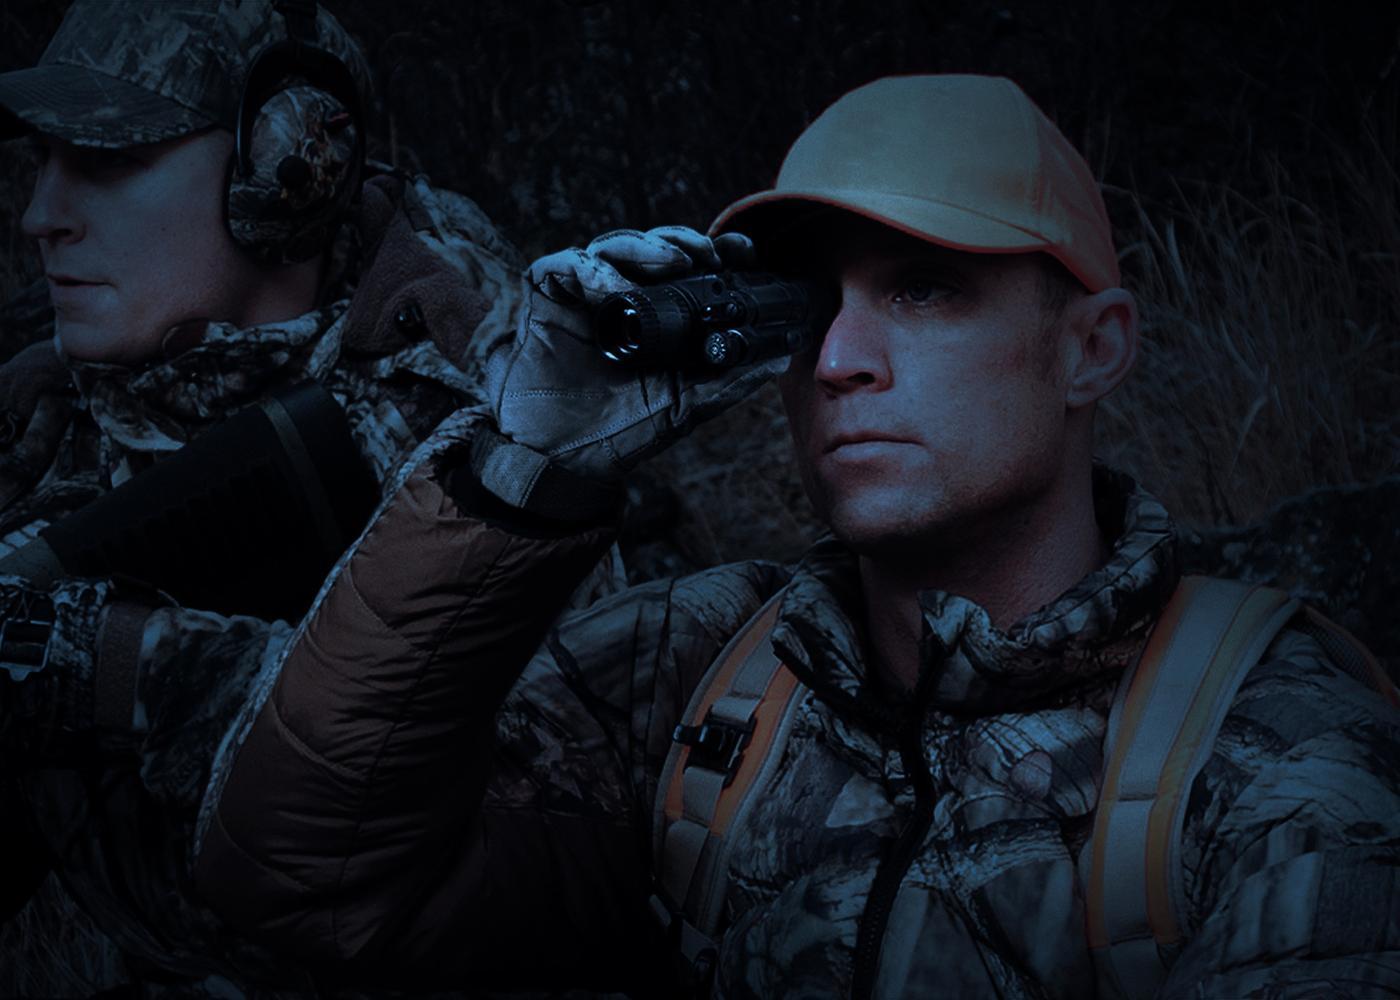 ARMASIGHT MNVD-40 2SD Multi-Purpose Night Monocular 2+ Def.